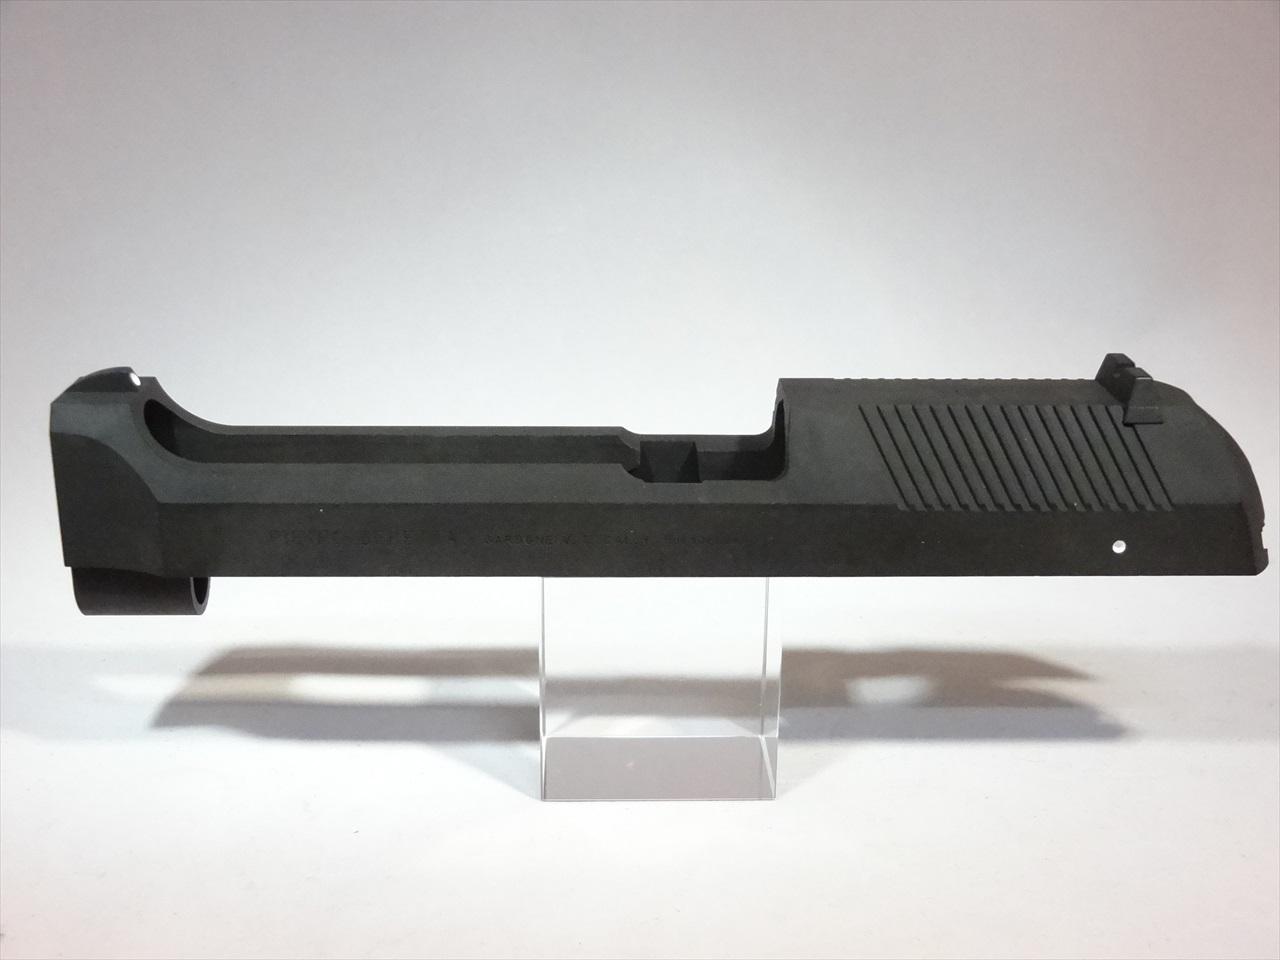 KSC M93R-Ⅱ(07) スライド(HW) No.802